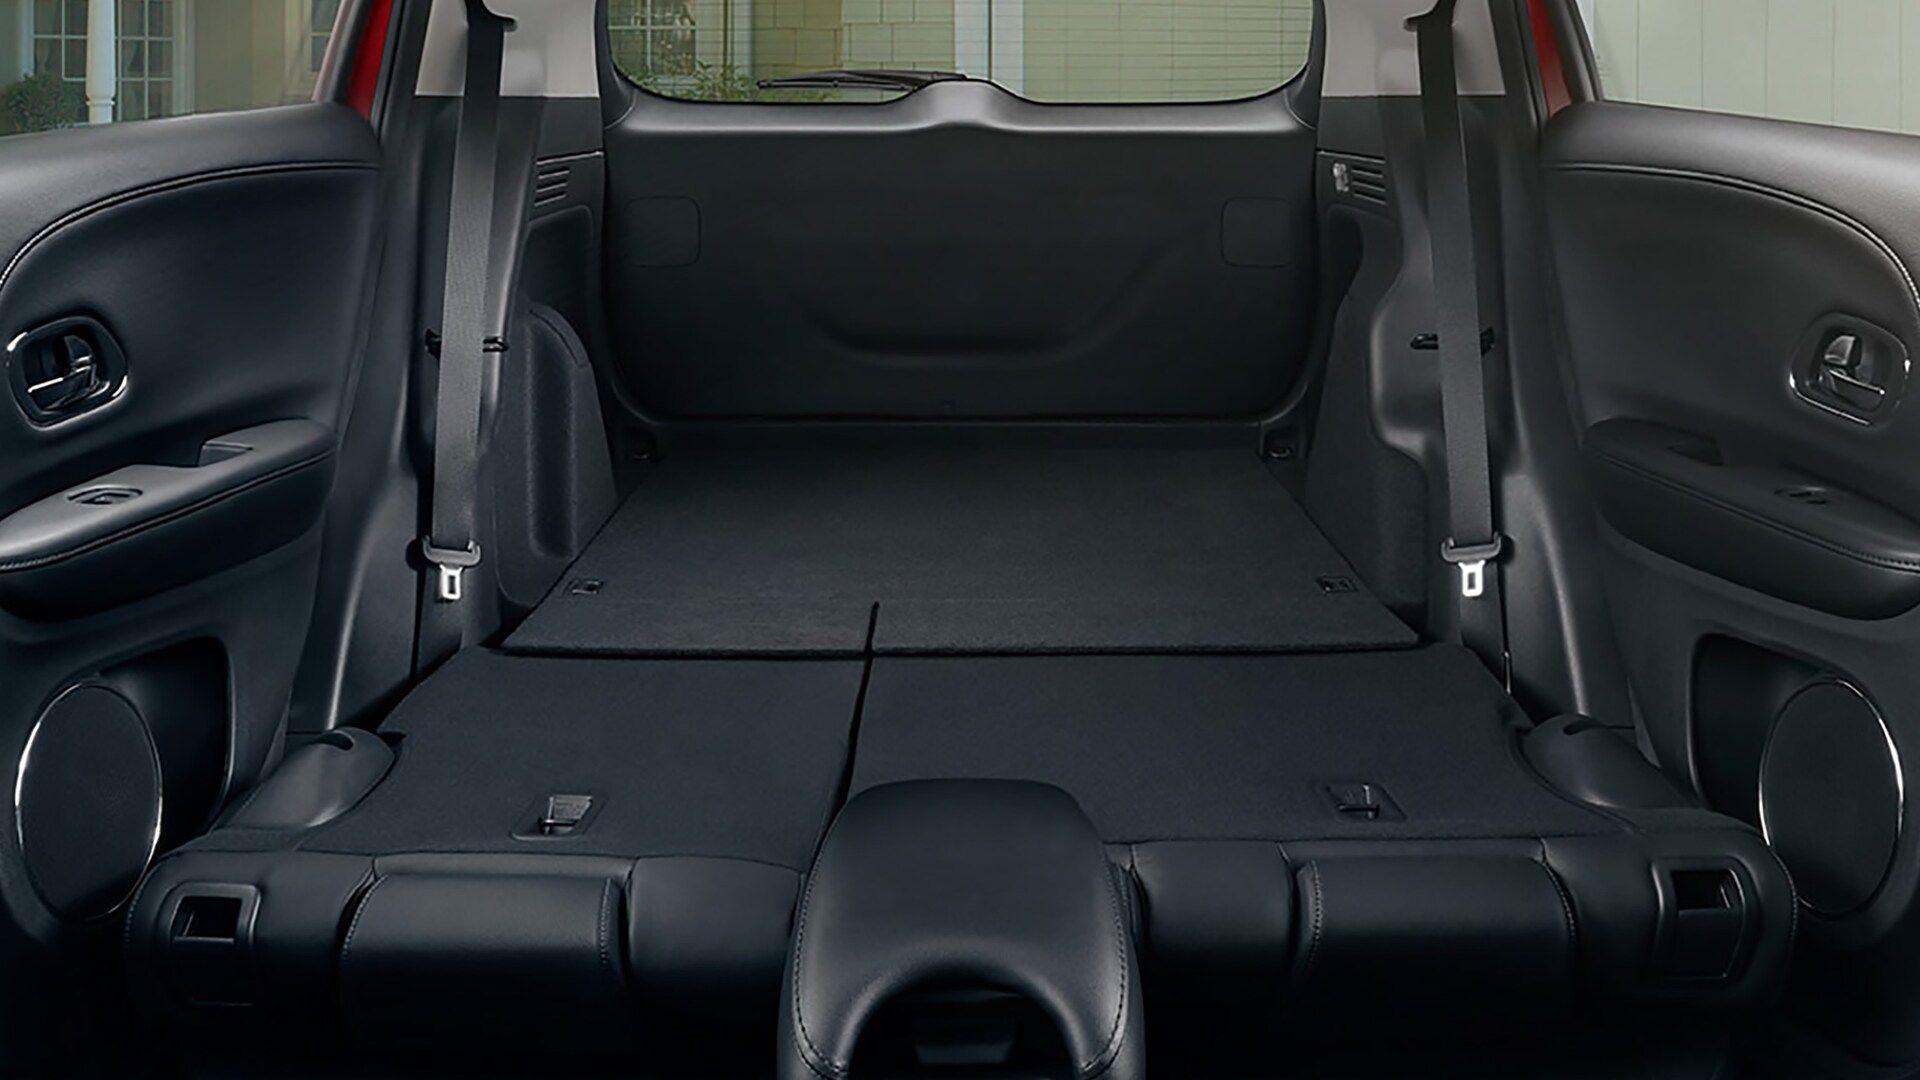 2020 Hona HR-V Interior Rear Folding Seats